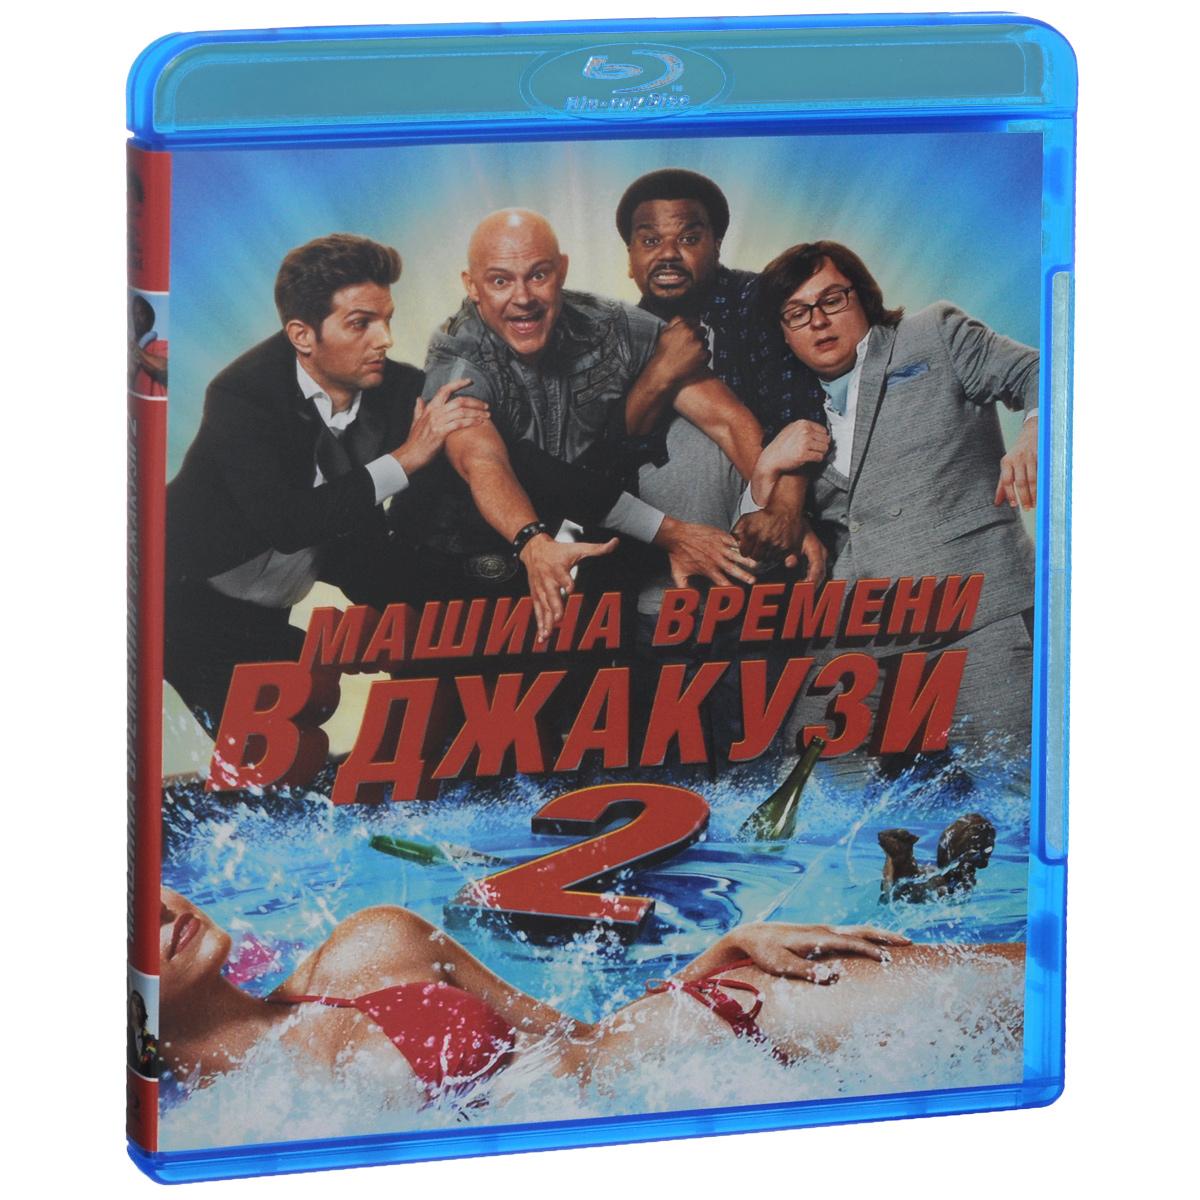 Машина времени в джакузи 2 (Blu-ray) 2 1 blu ray